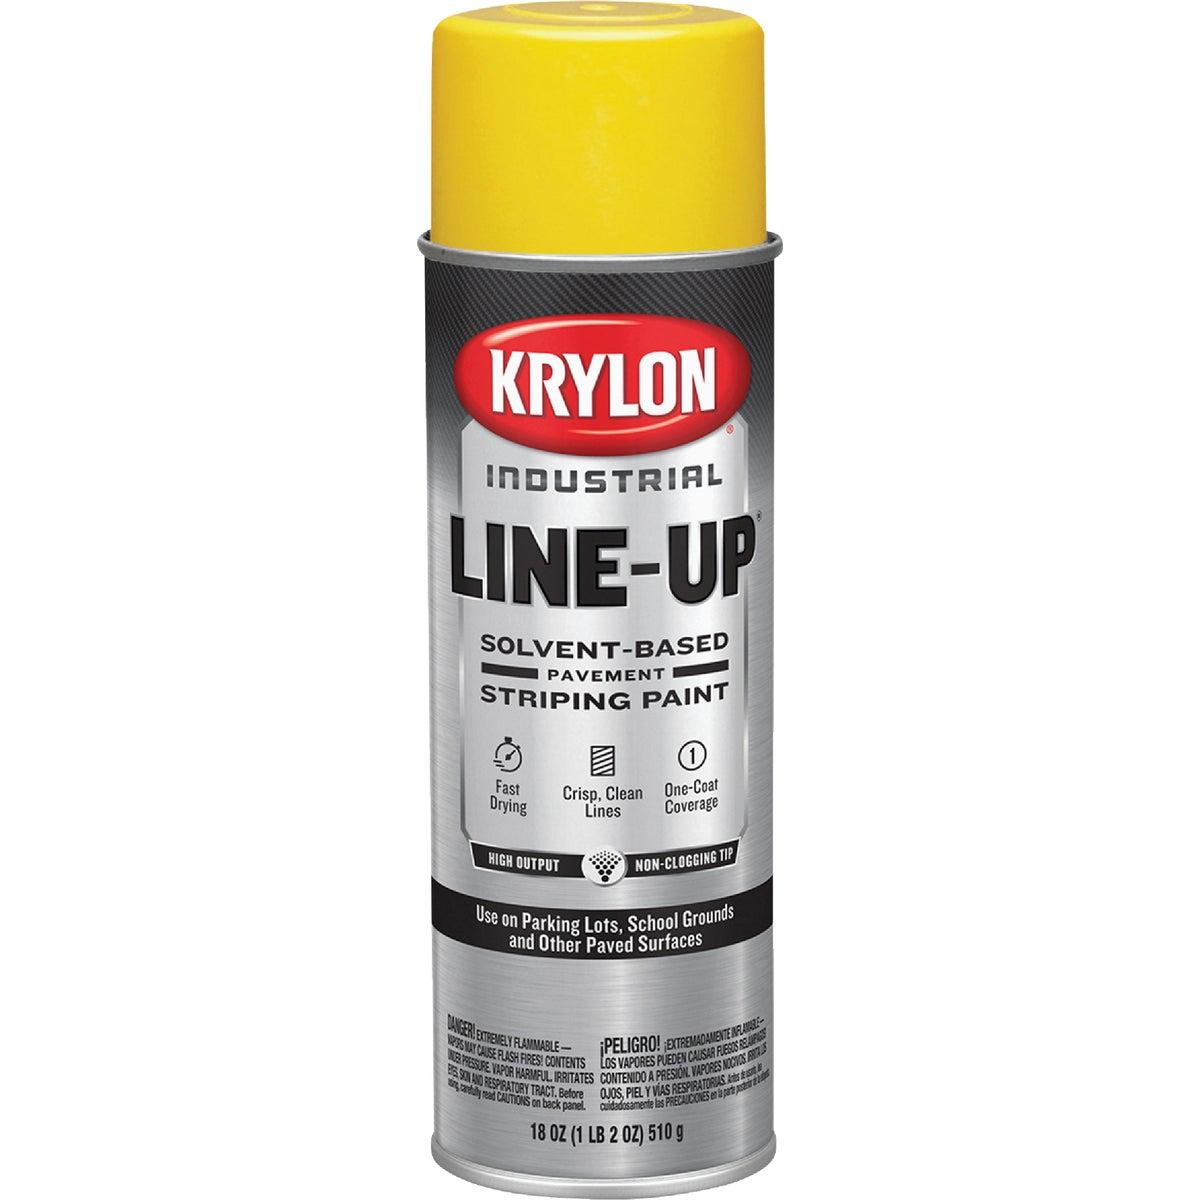 Krylon/Consumer Div HGHWY YEL STRIPING PAINT K07341000